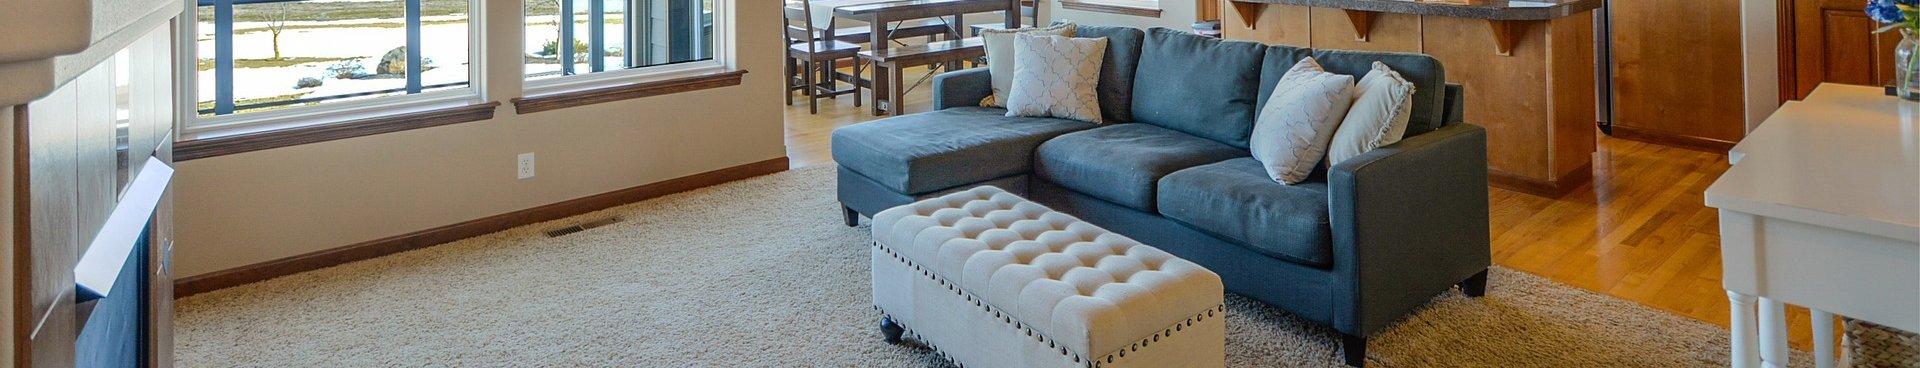 chaise longue moderno - MakroMueble